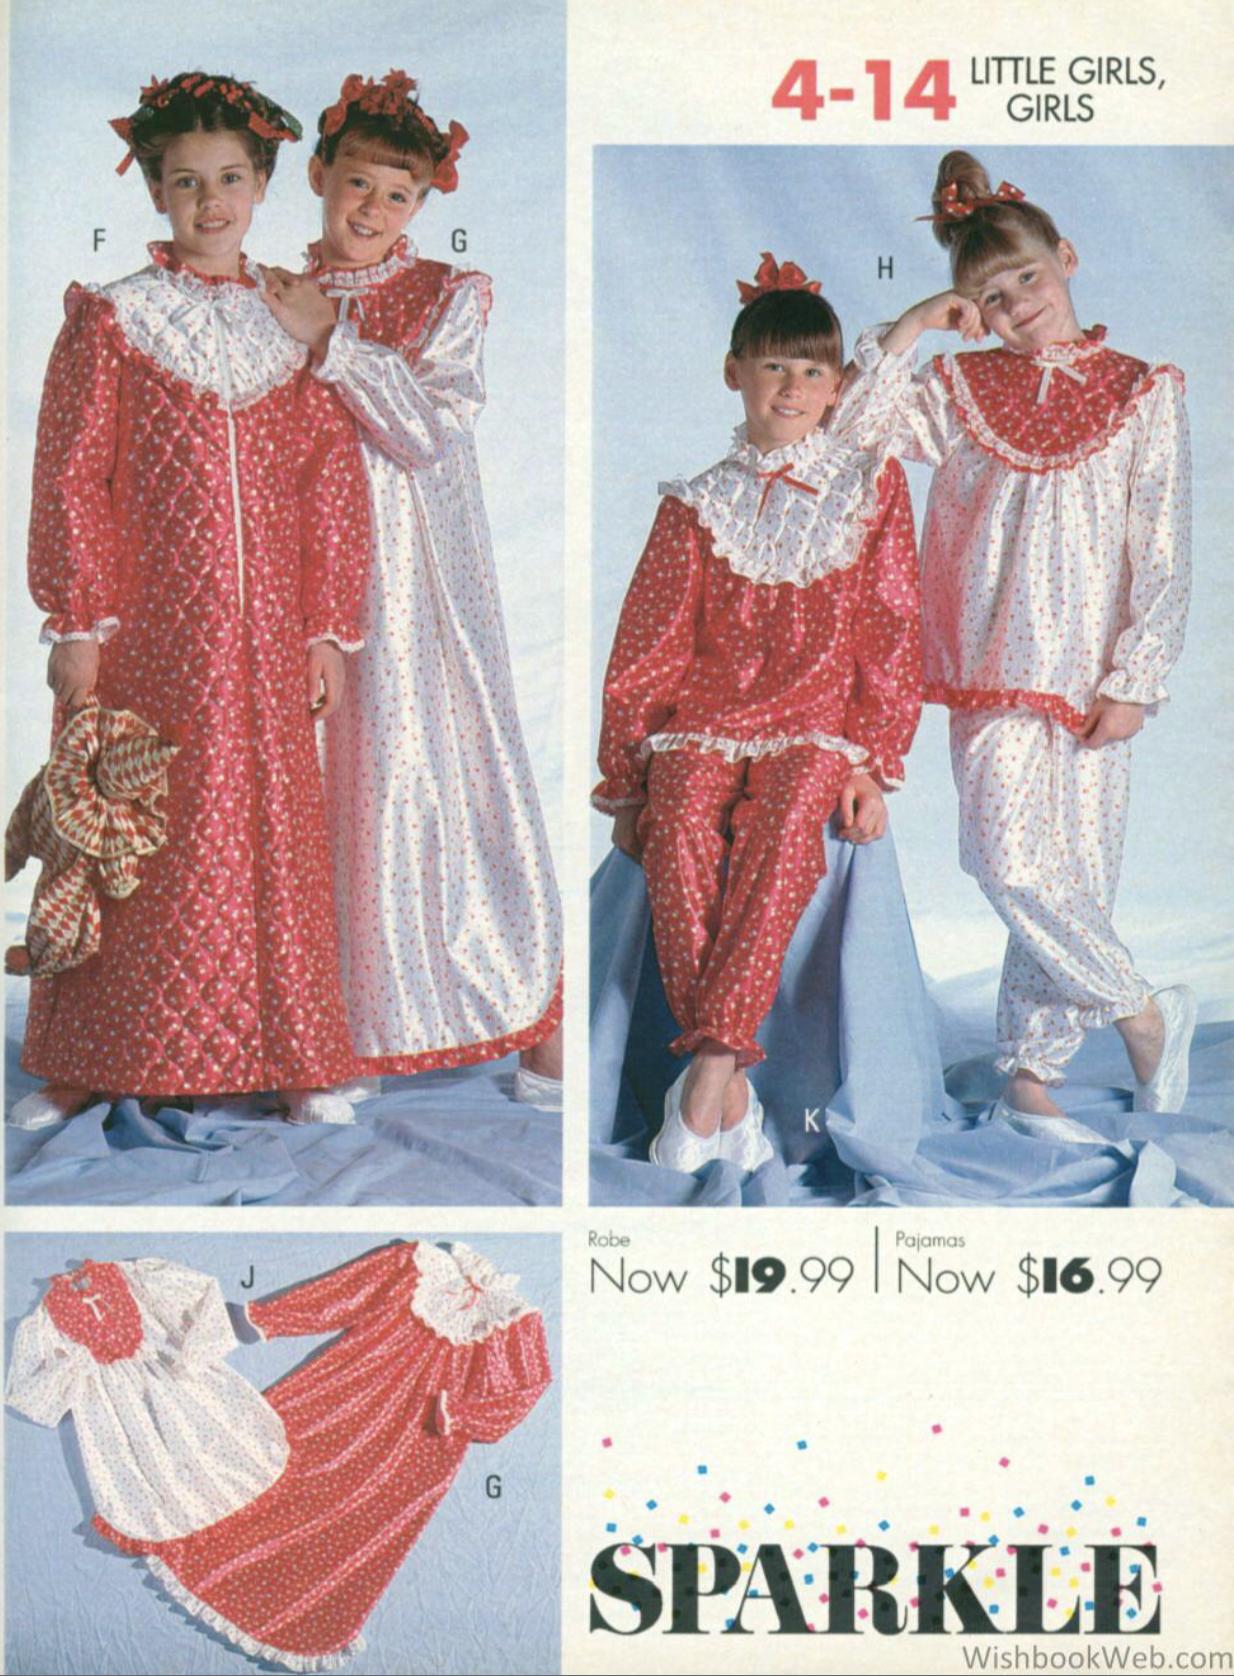 Nikki Wished for These Christmas Pajamas - wishbookweb.com